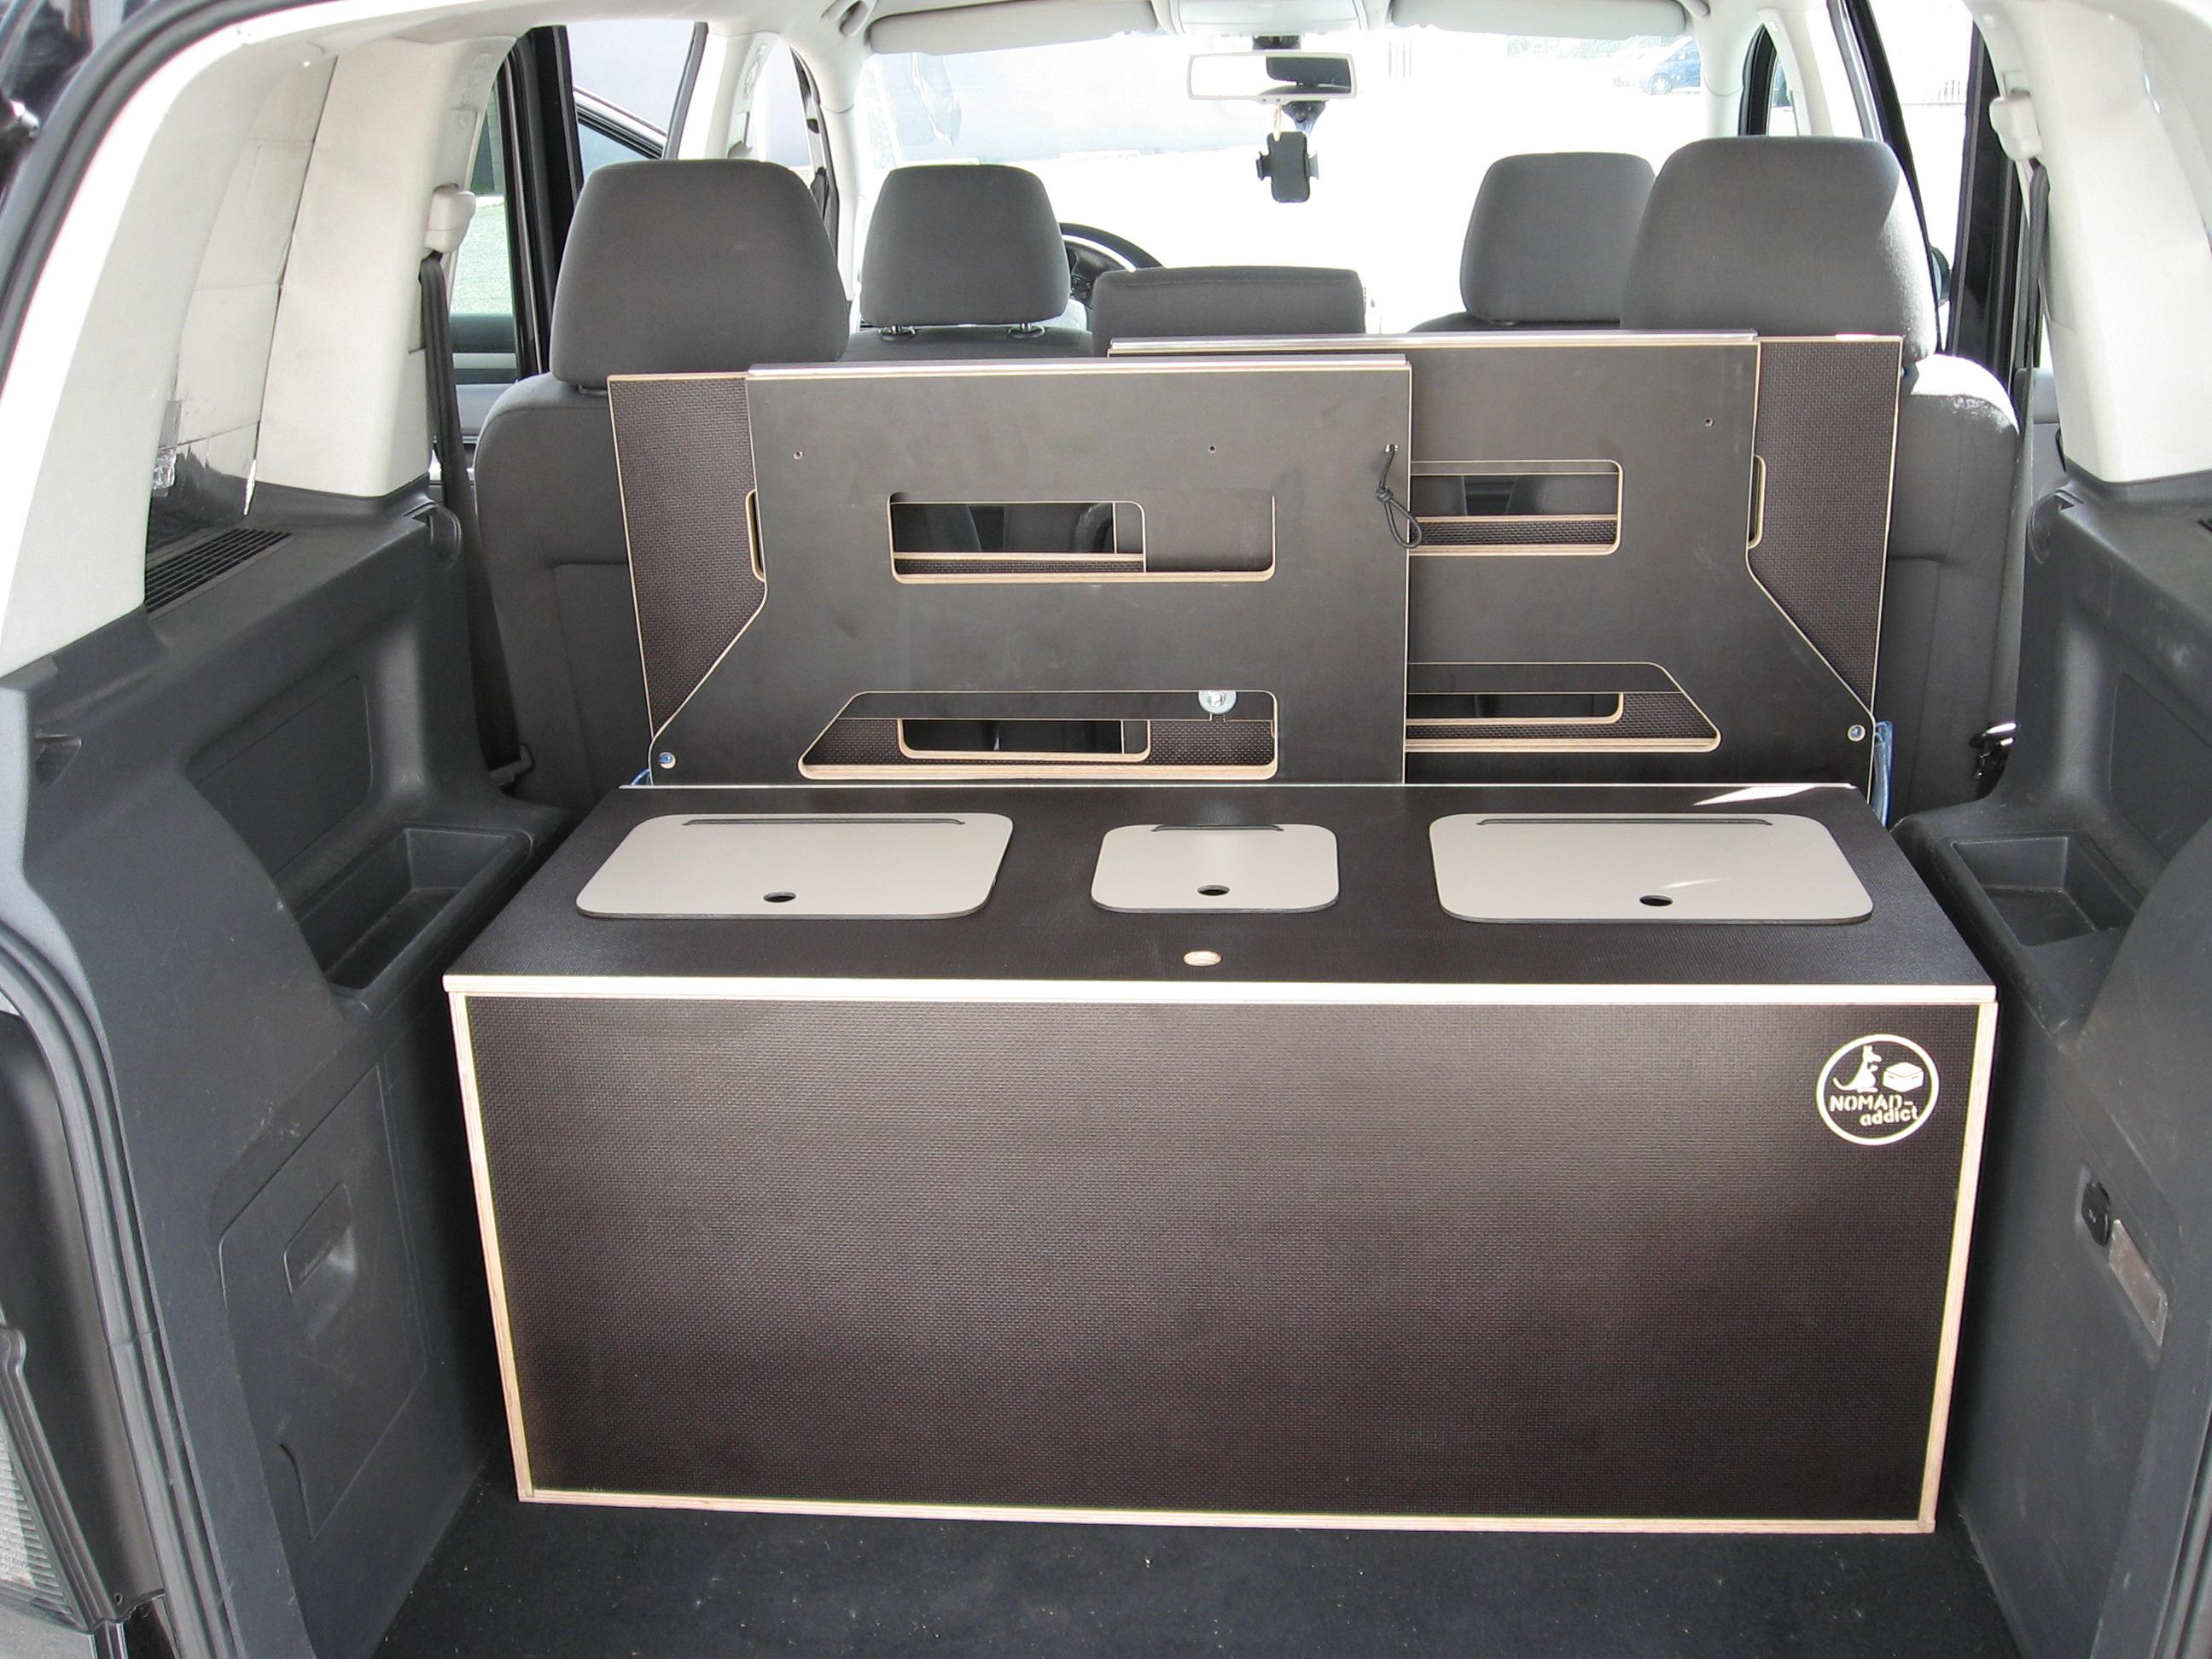 le kit duo 975 nomad addict. Black Bedroom Furniture Sets. Home Design Ideas